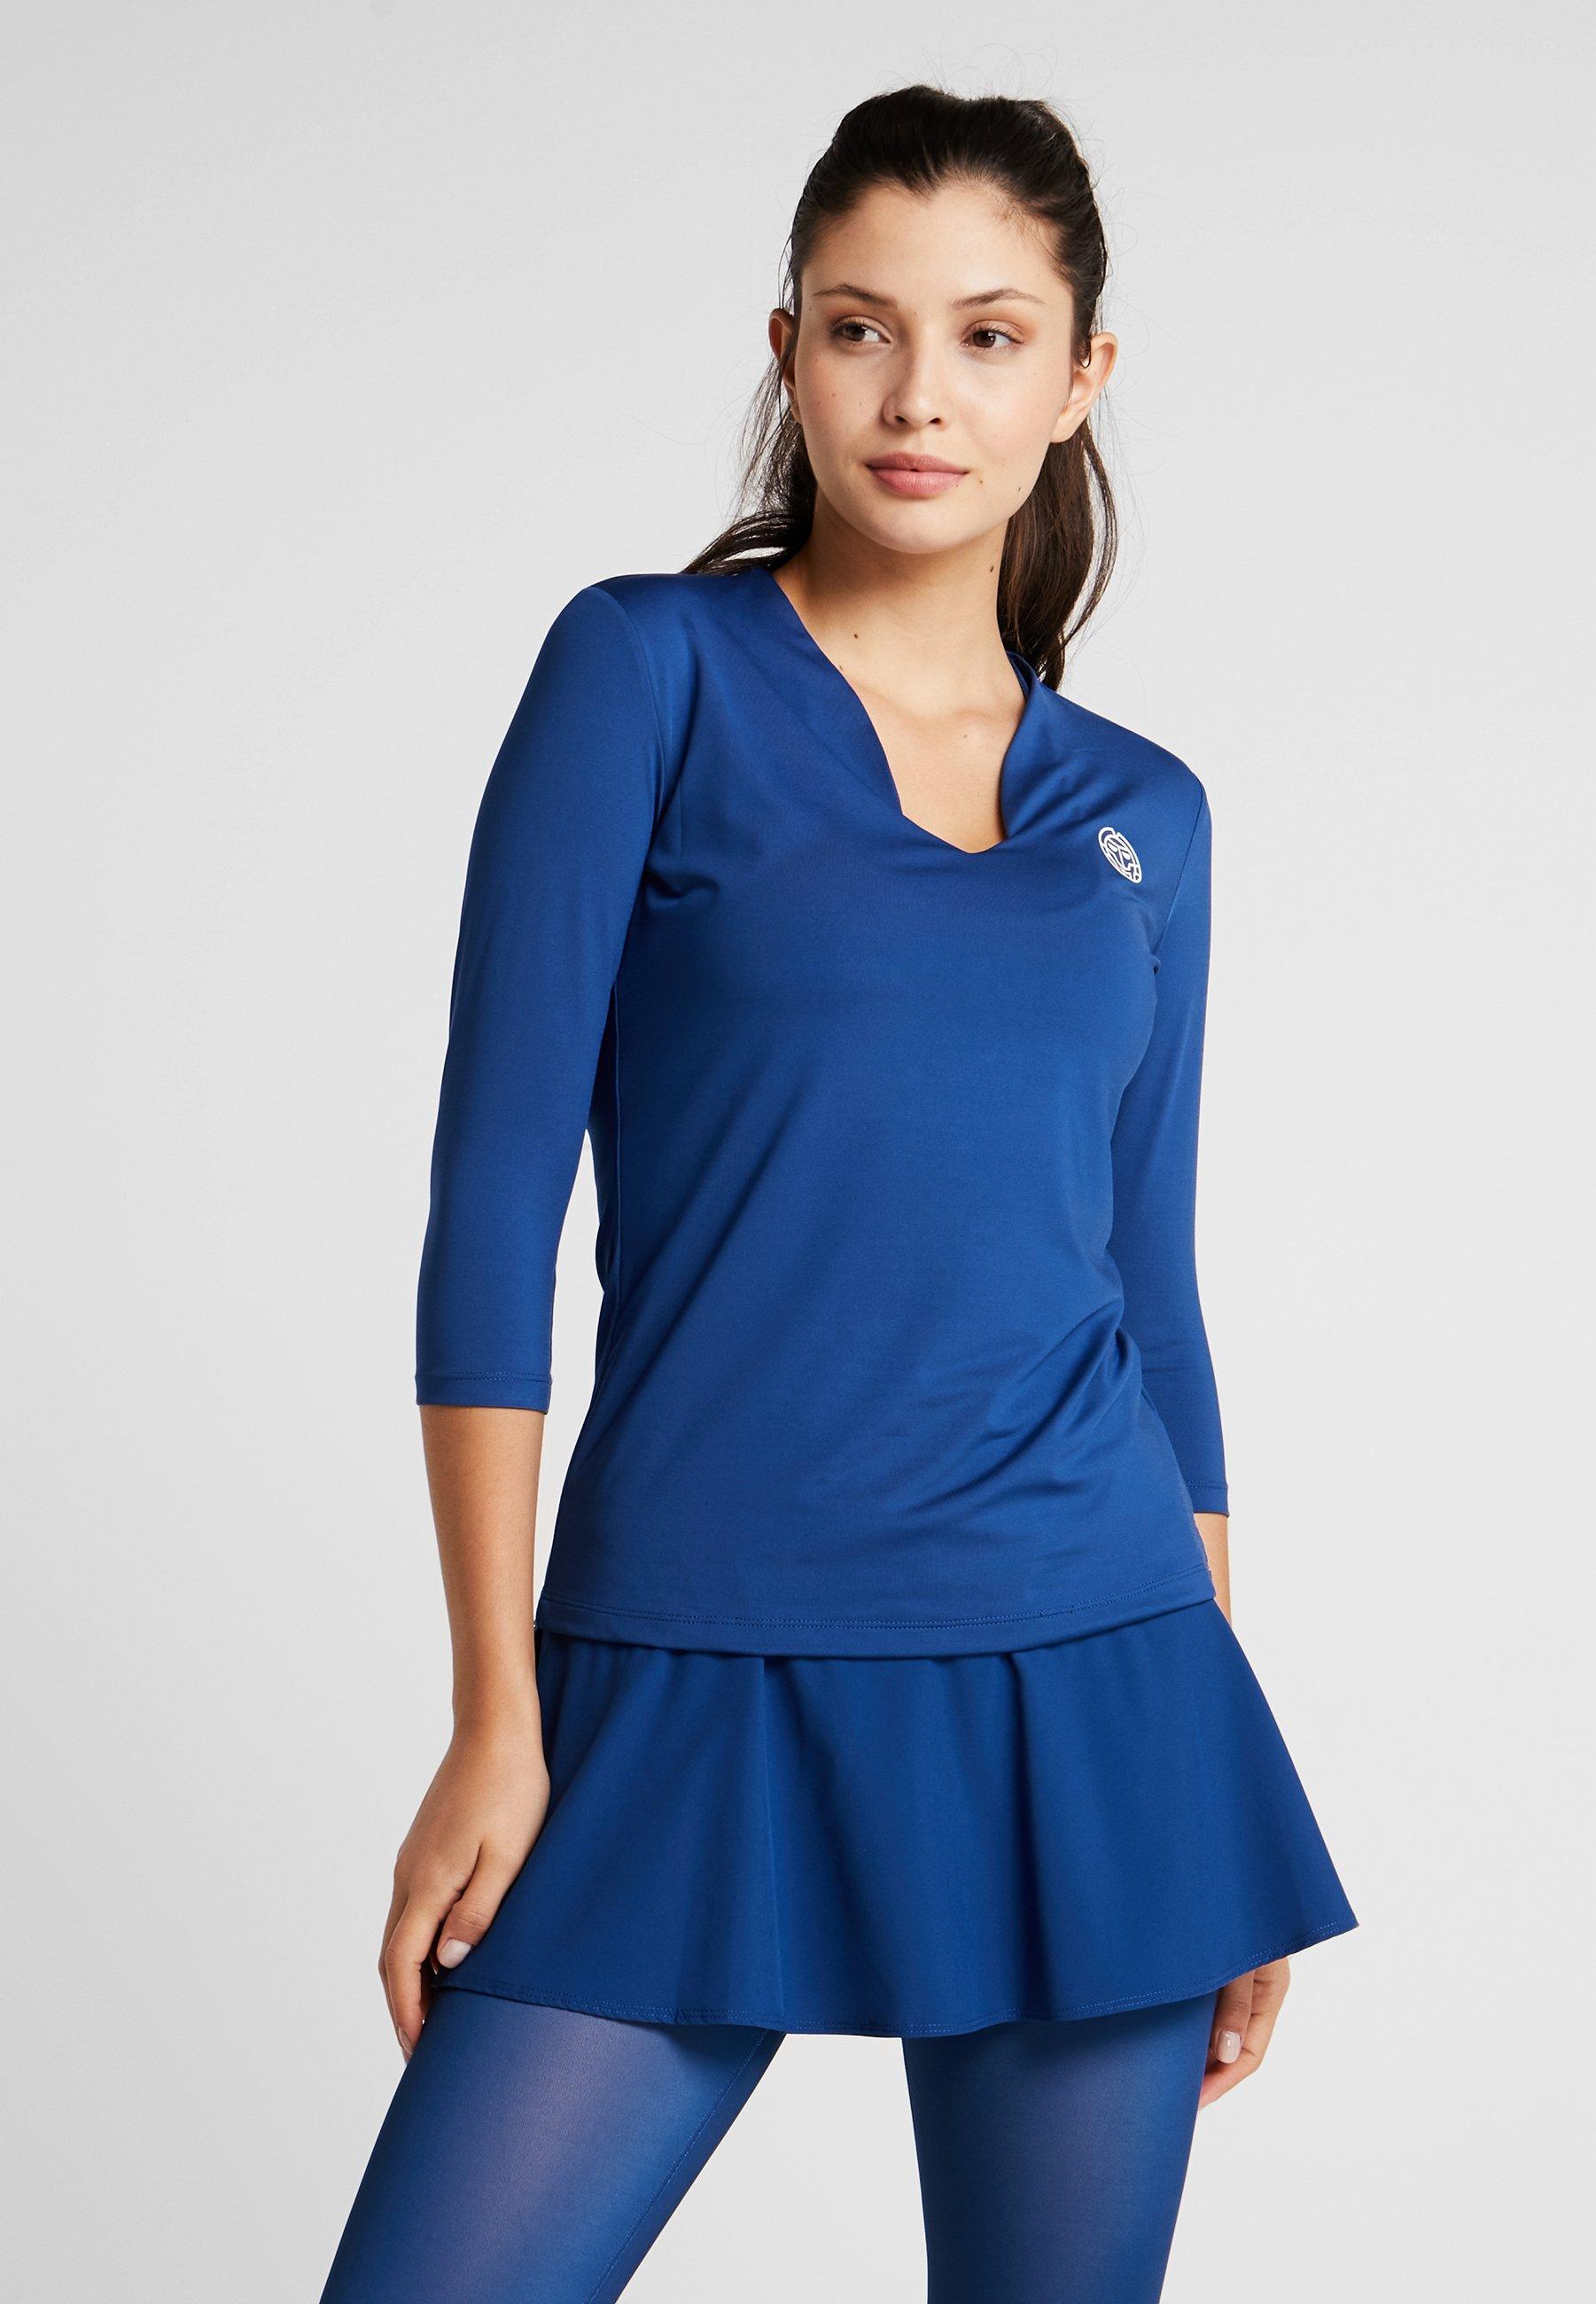 Women ARIANA TECH V NECK LONGSLEEVE - Long sleeved top